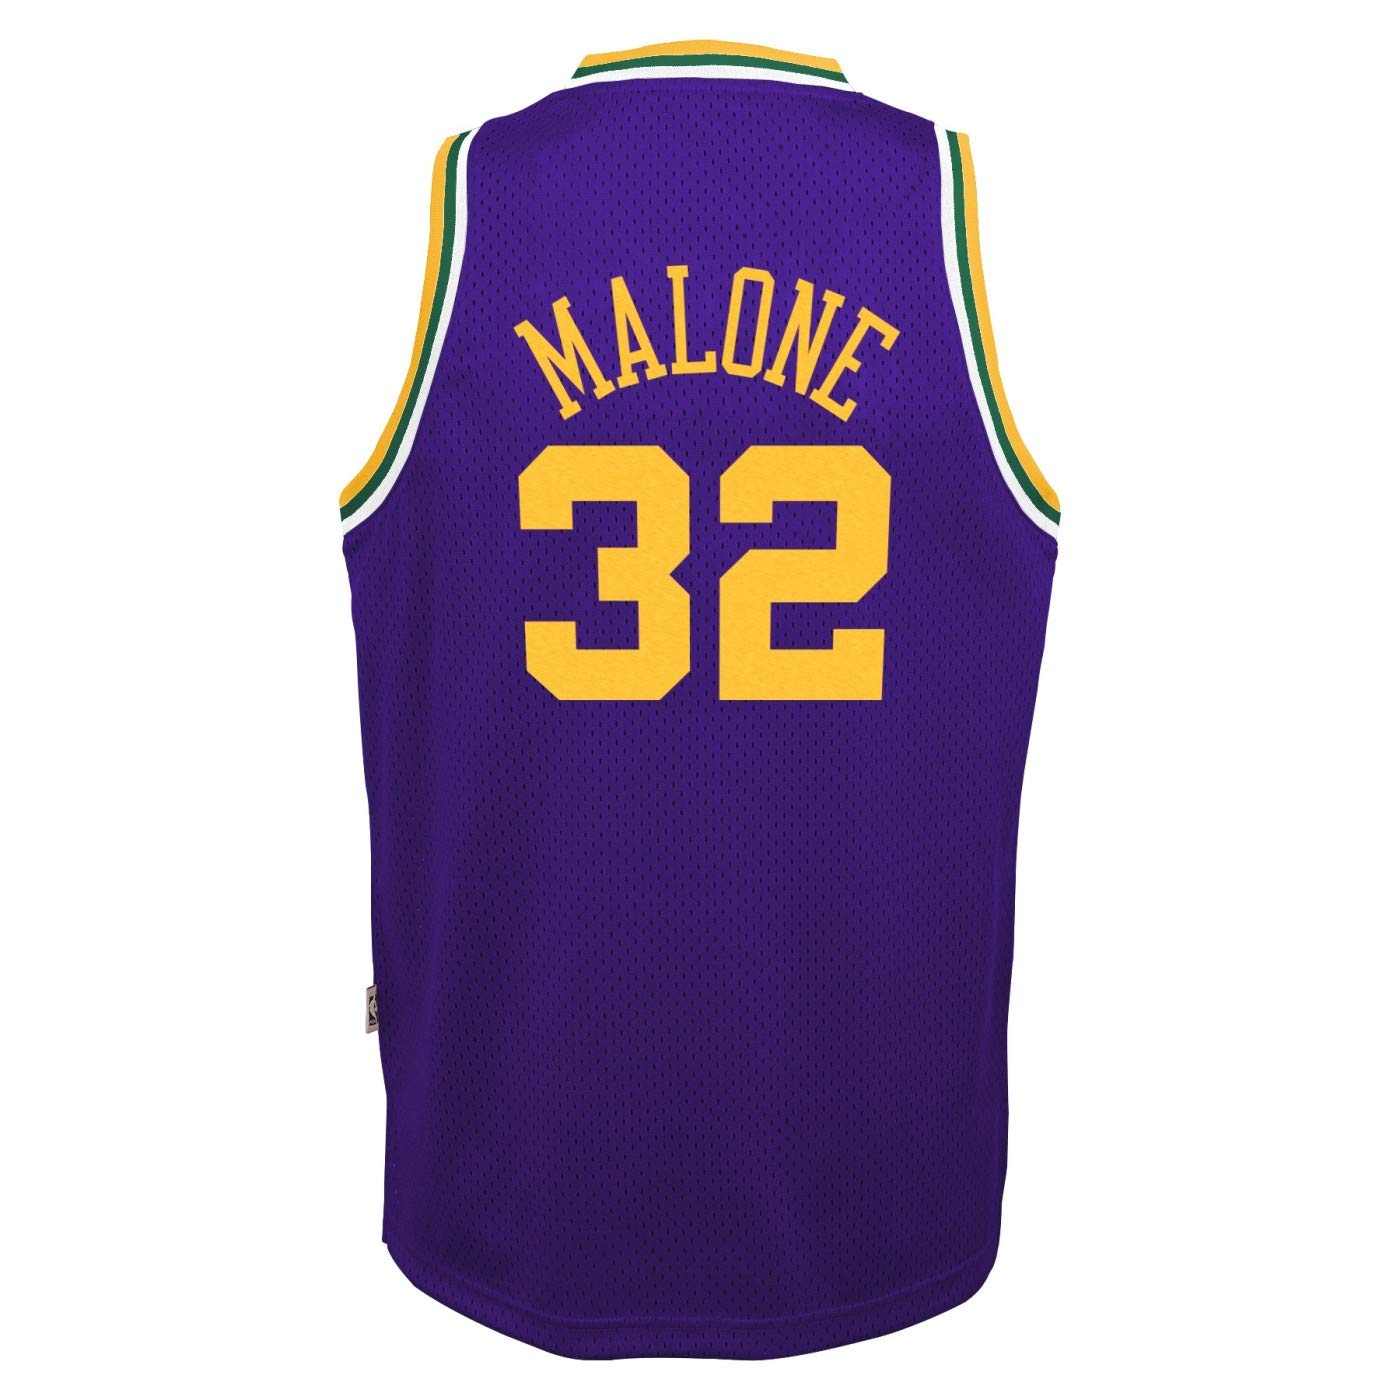 472bc9987ad5e Amazon.com : Outerstuff Karl Malone Utah Jazz NBA Youth Throwback ...